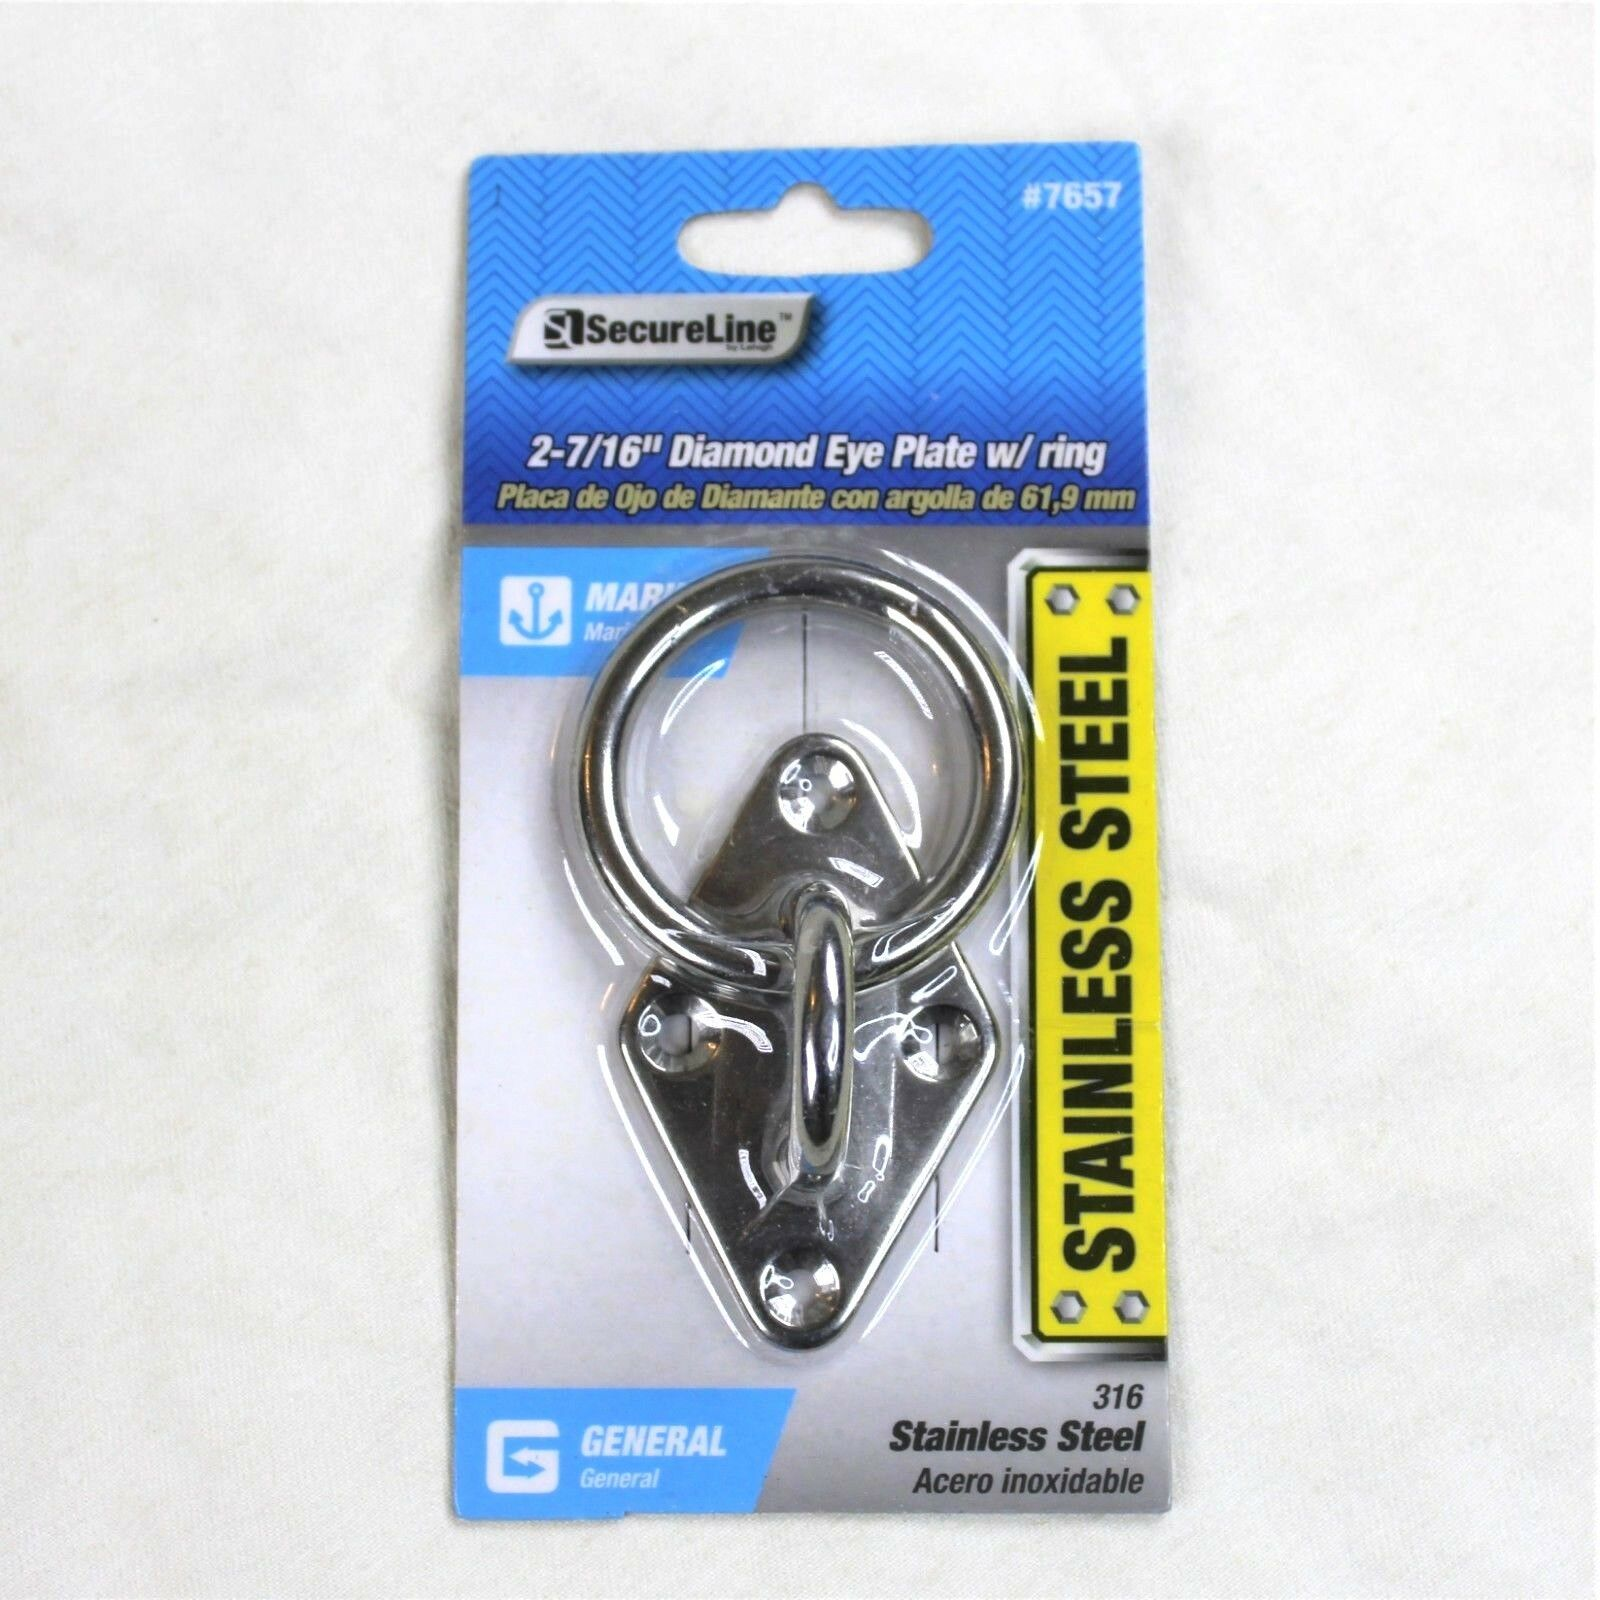 "SecureLine 2 7/16"" Marine 316 Stainless Steel Diamond Eye Plate Ring Silver"